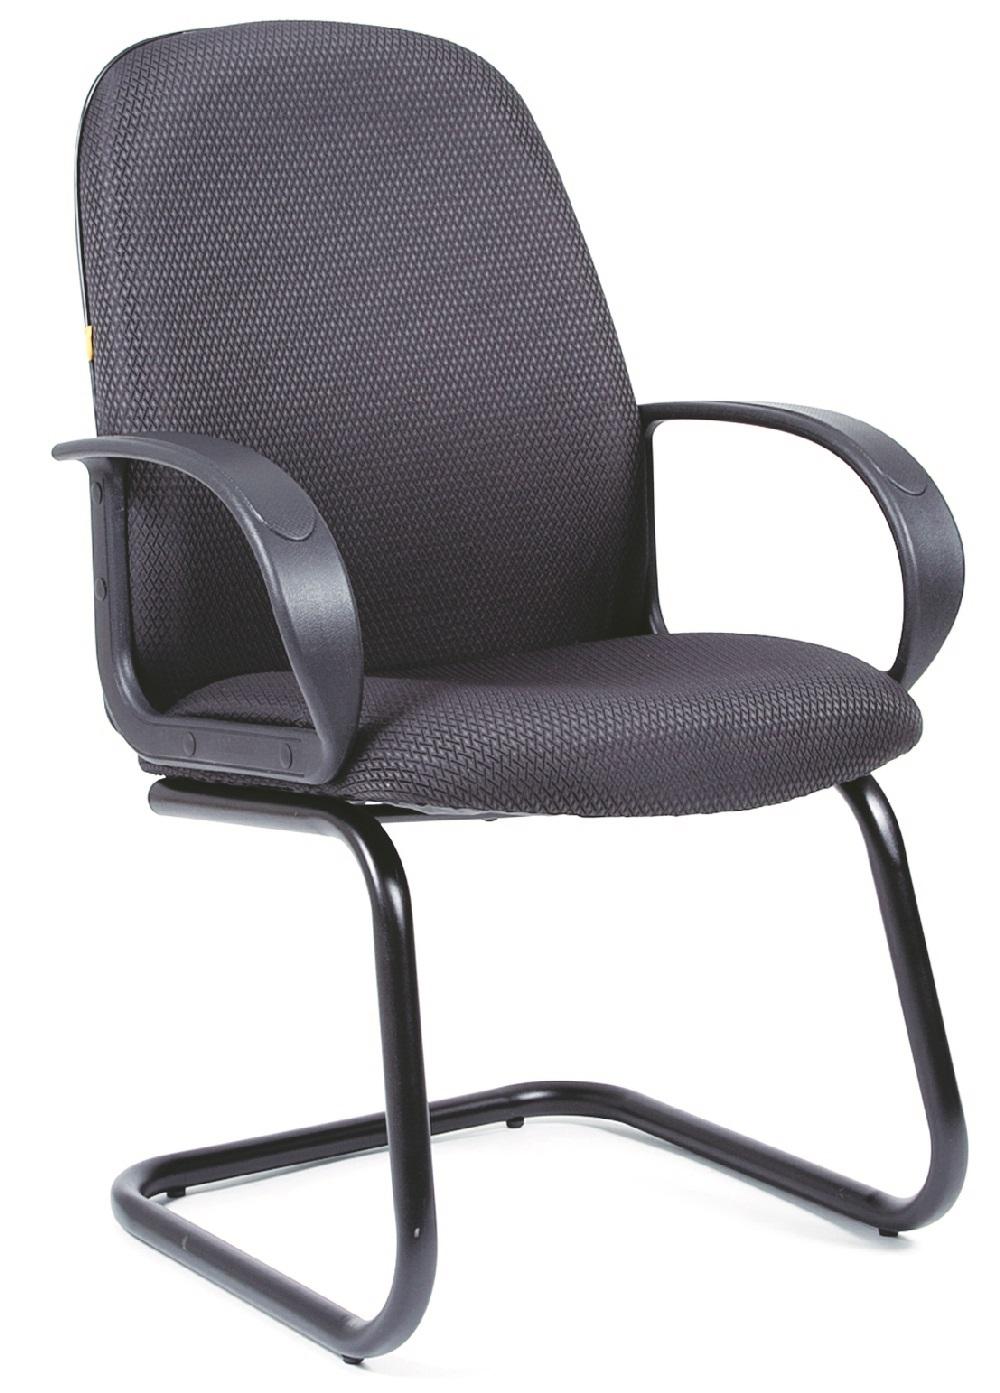 Кресло посетителя CH-279V ткань JP серый Chairman 279V